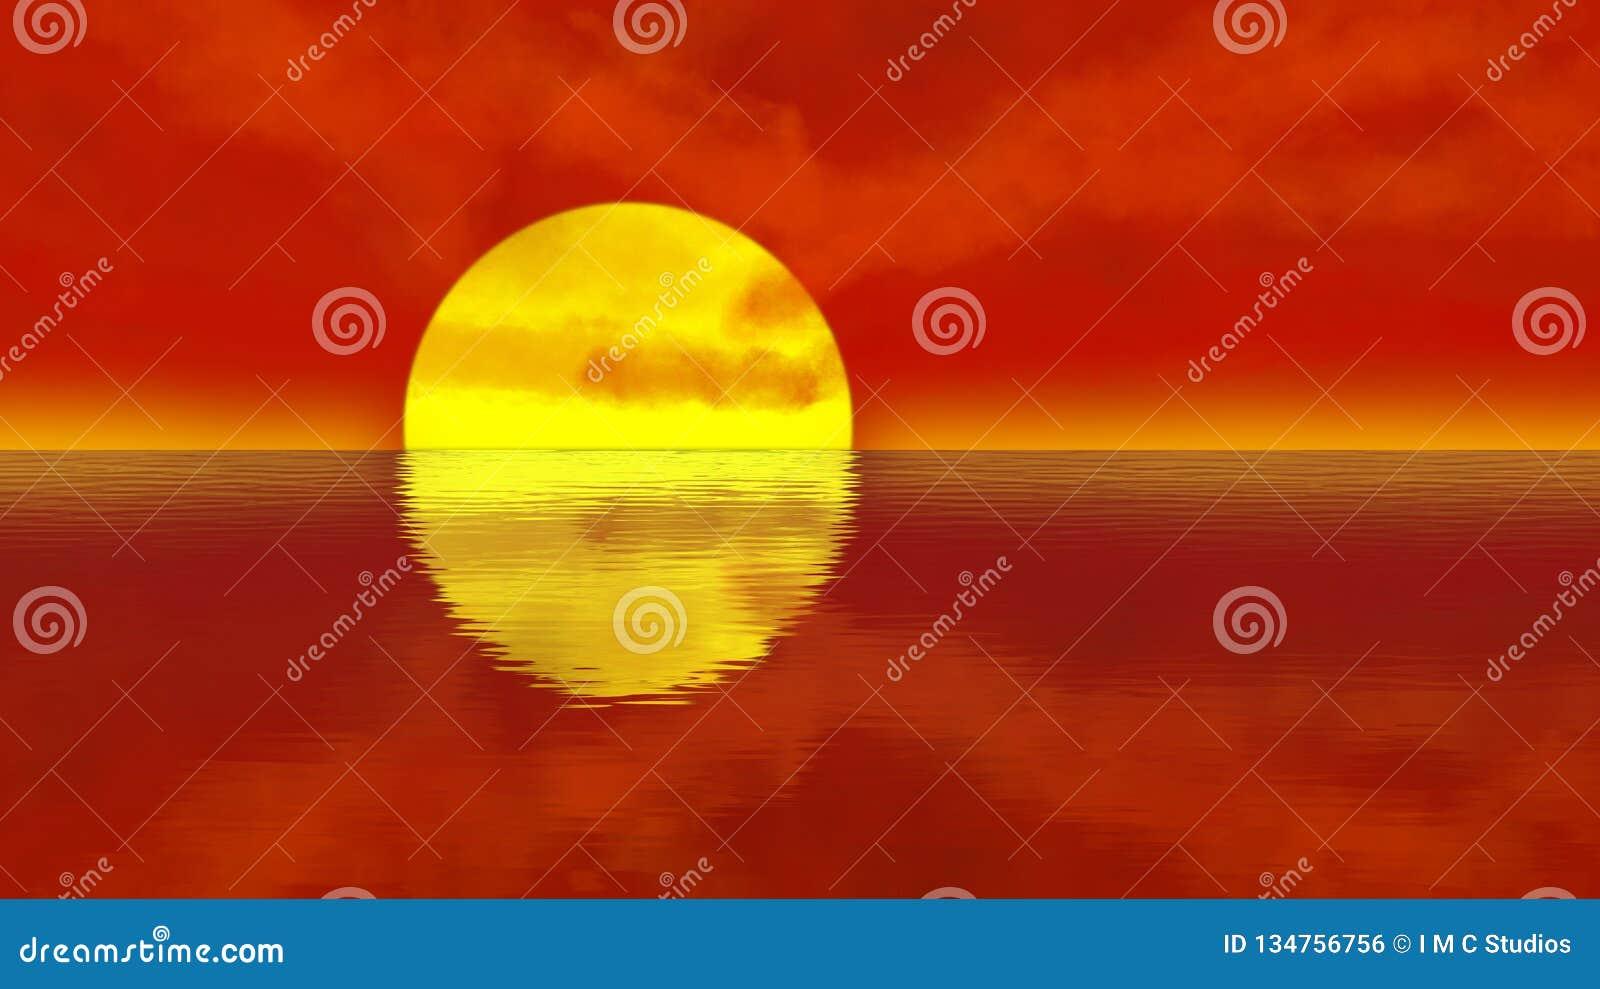 Orange sunset over calm water ripples